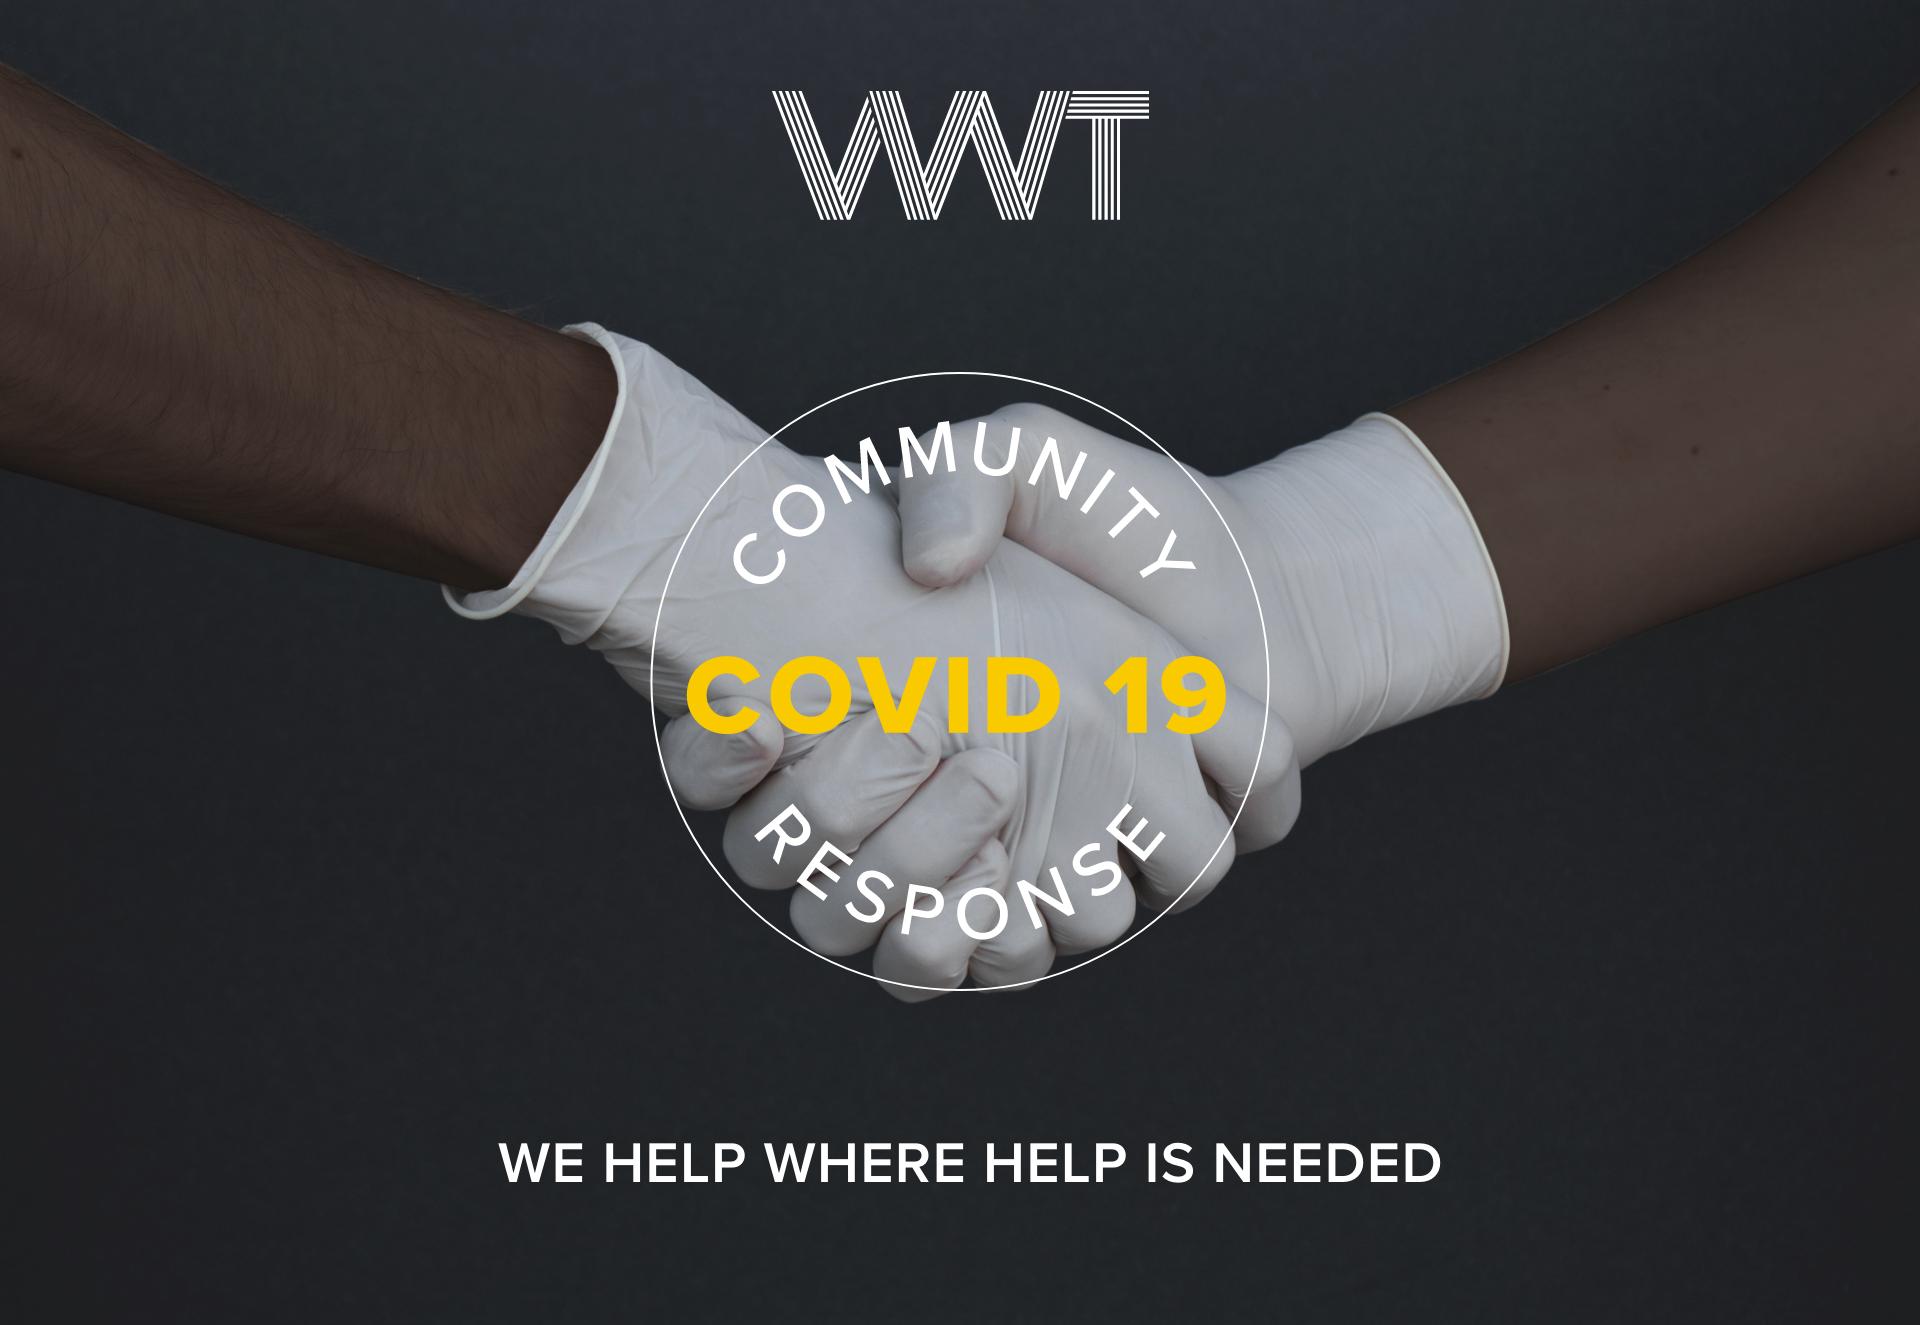 VWT Covid Response